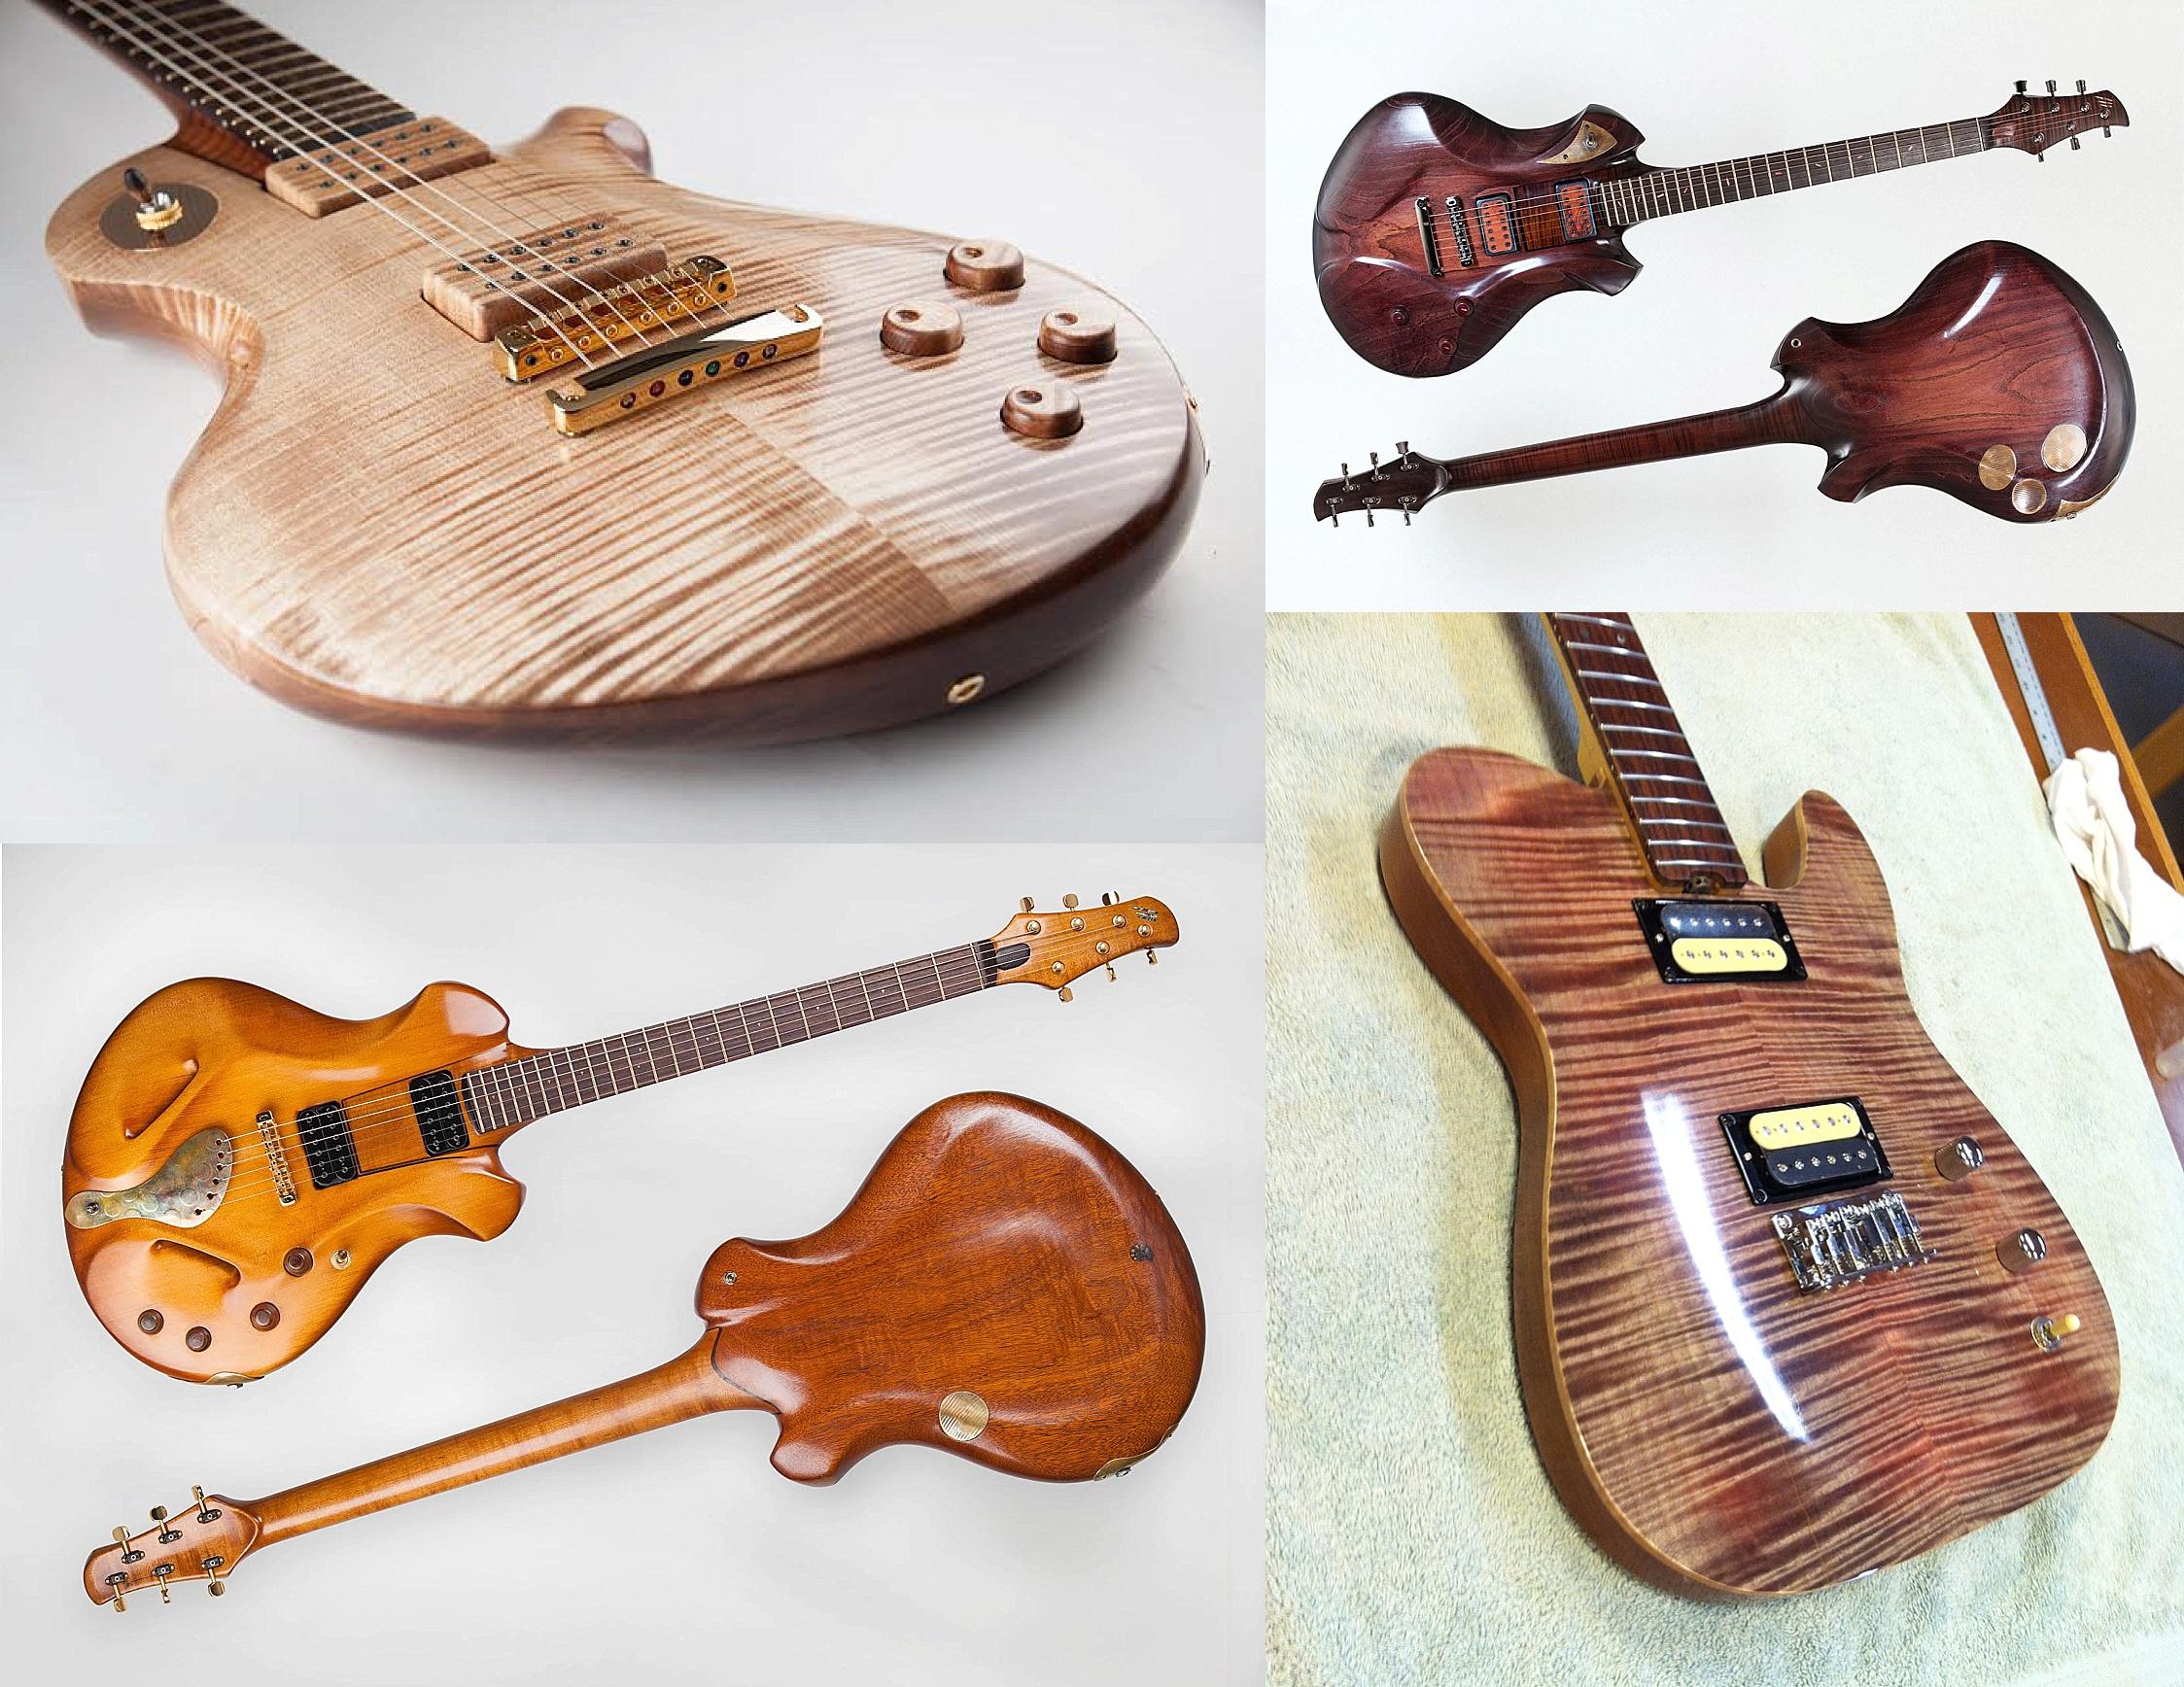 roasted-torrified-guitar-builds.jpg